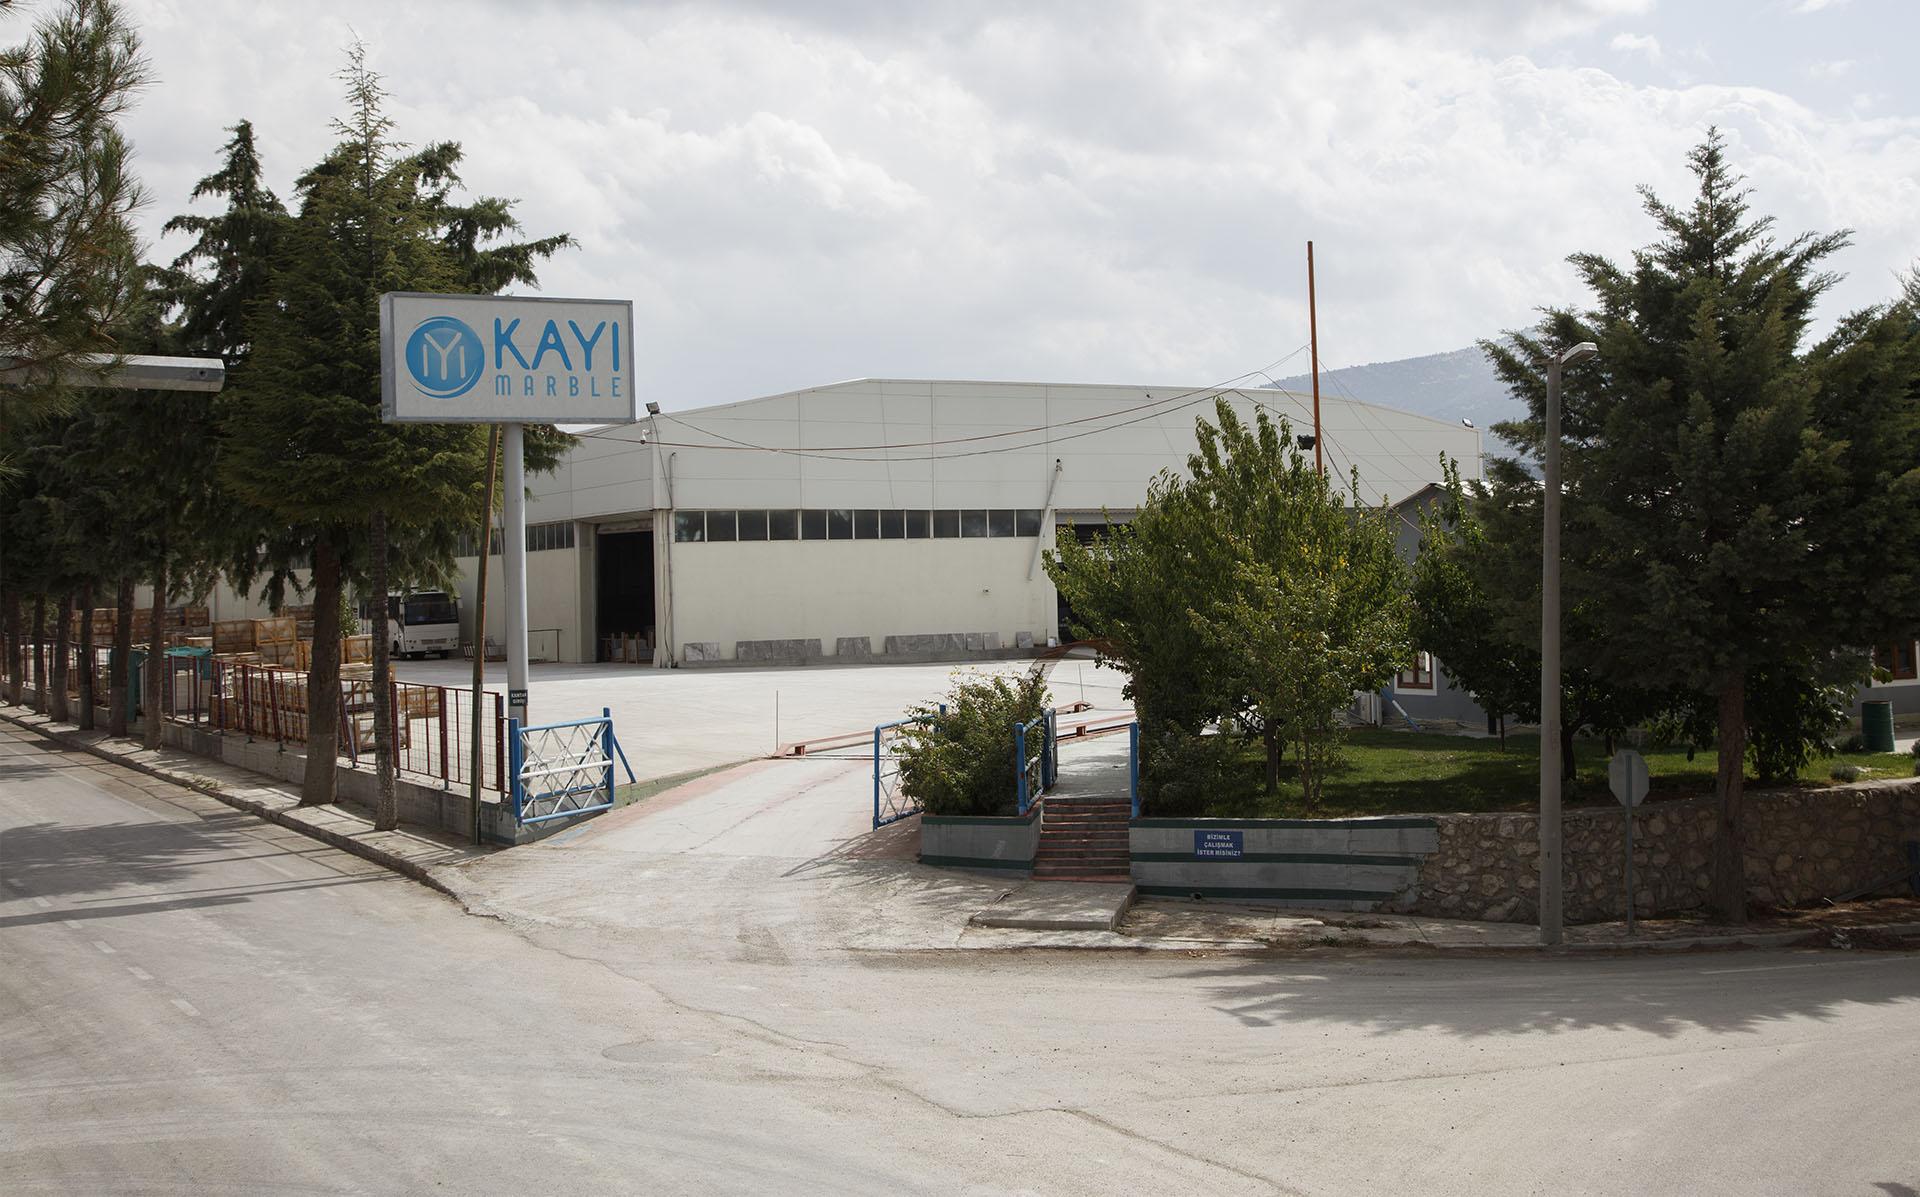 Kayı BEIGE fabrica